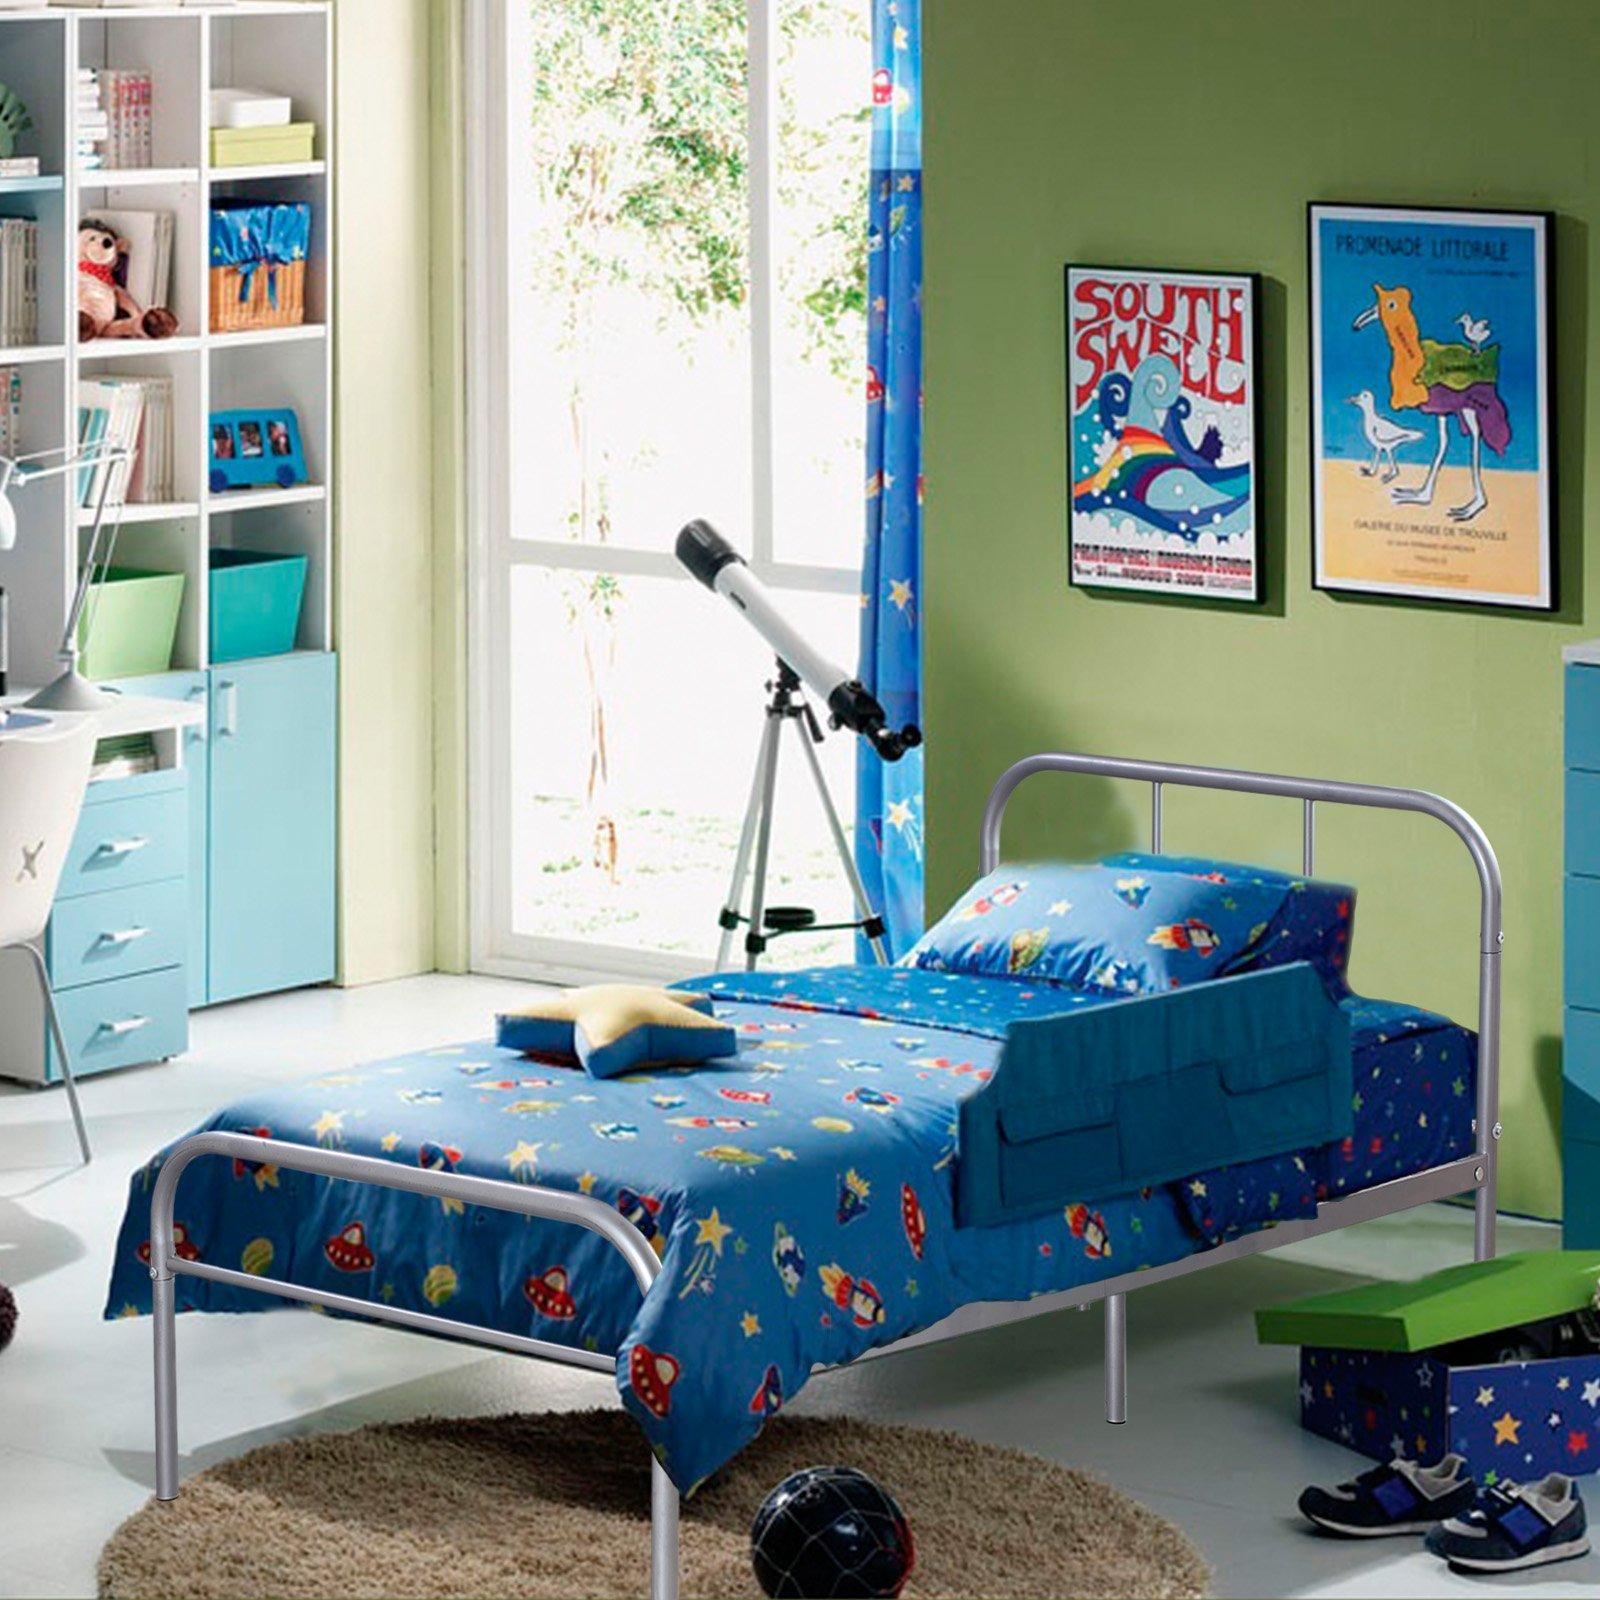 Kingpex Metal Bed Frame Twin Size Sliver / 6 Legs Platform Mattress Foundation Headboard Footboard/No Box Spring Needed Boys Kids Adult Bedroom